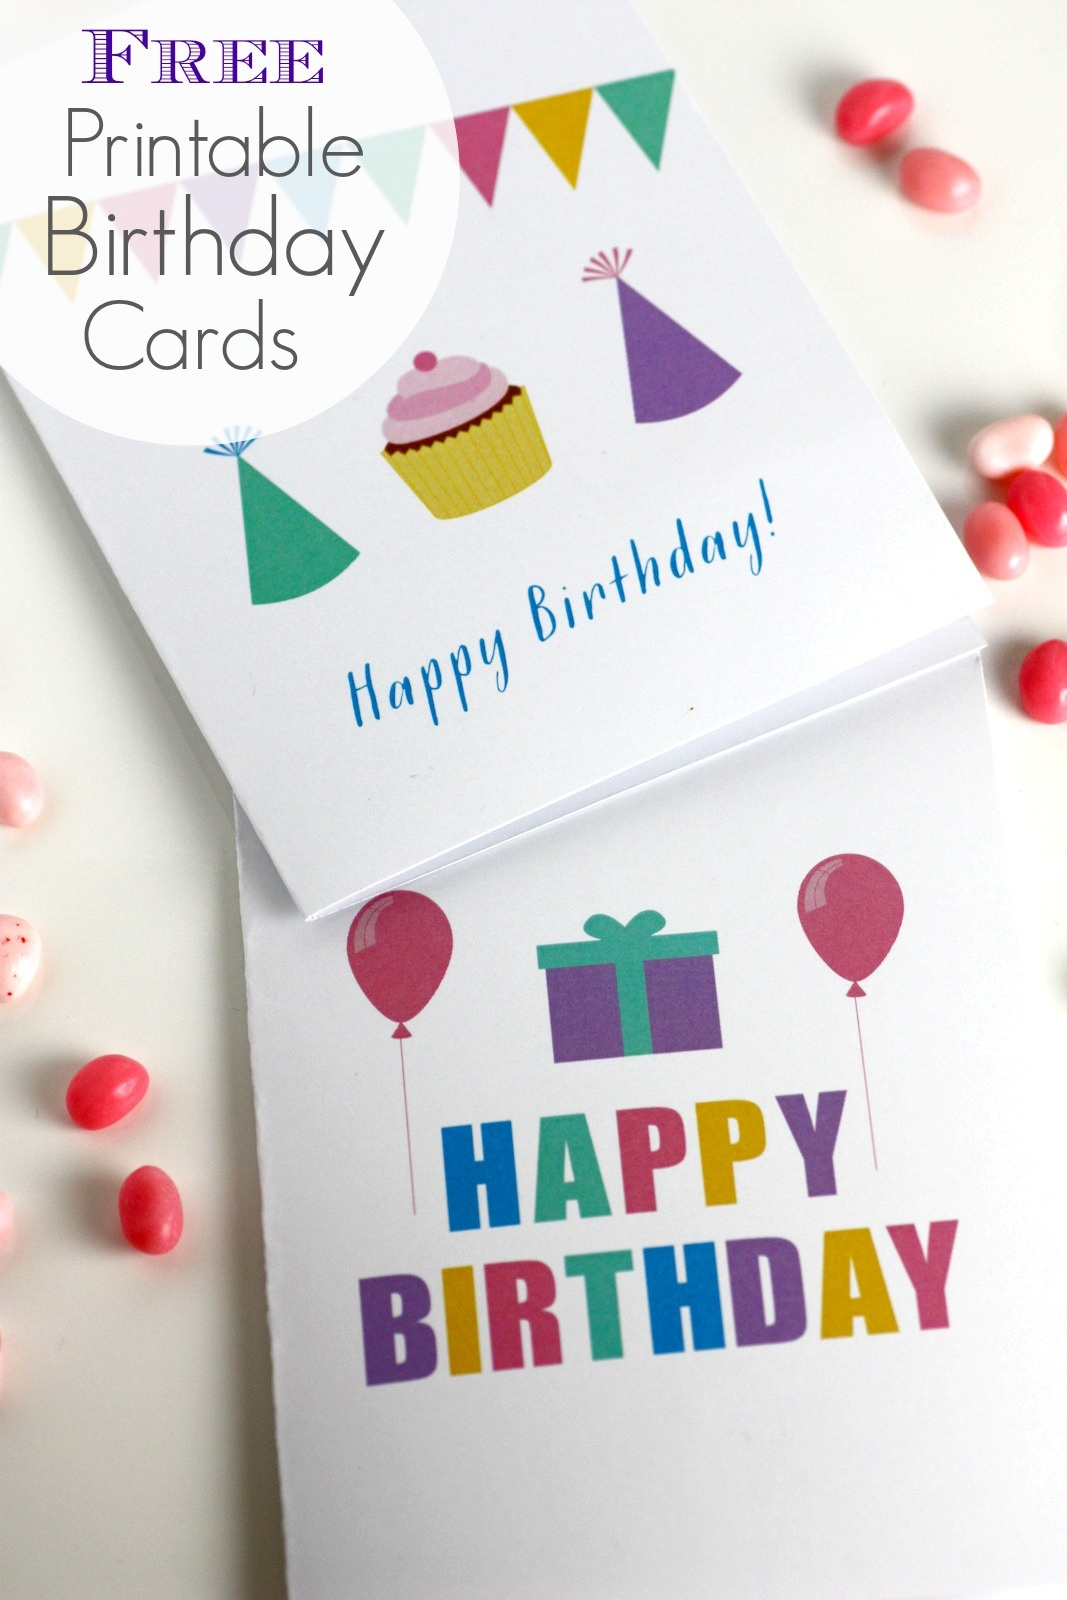 Free Printable Blank Birthday Cards | Catch My Party - Free Printable Personalized Birthday Cards